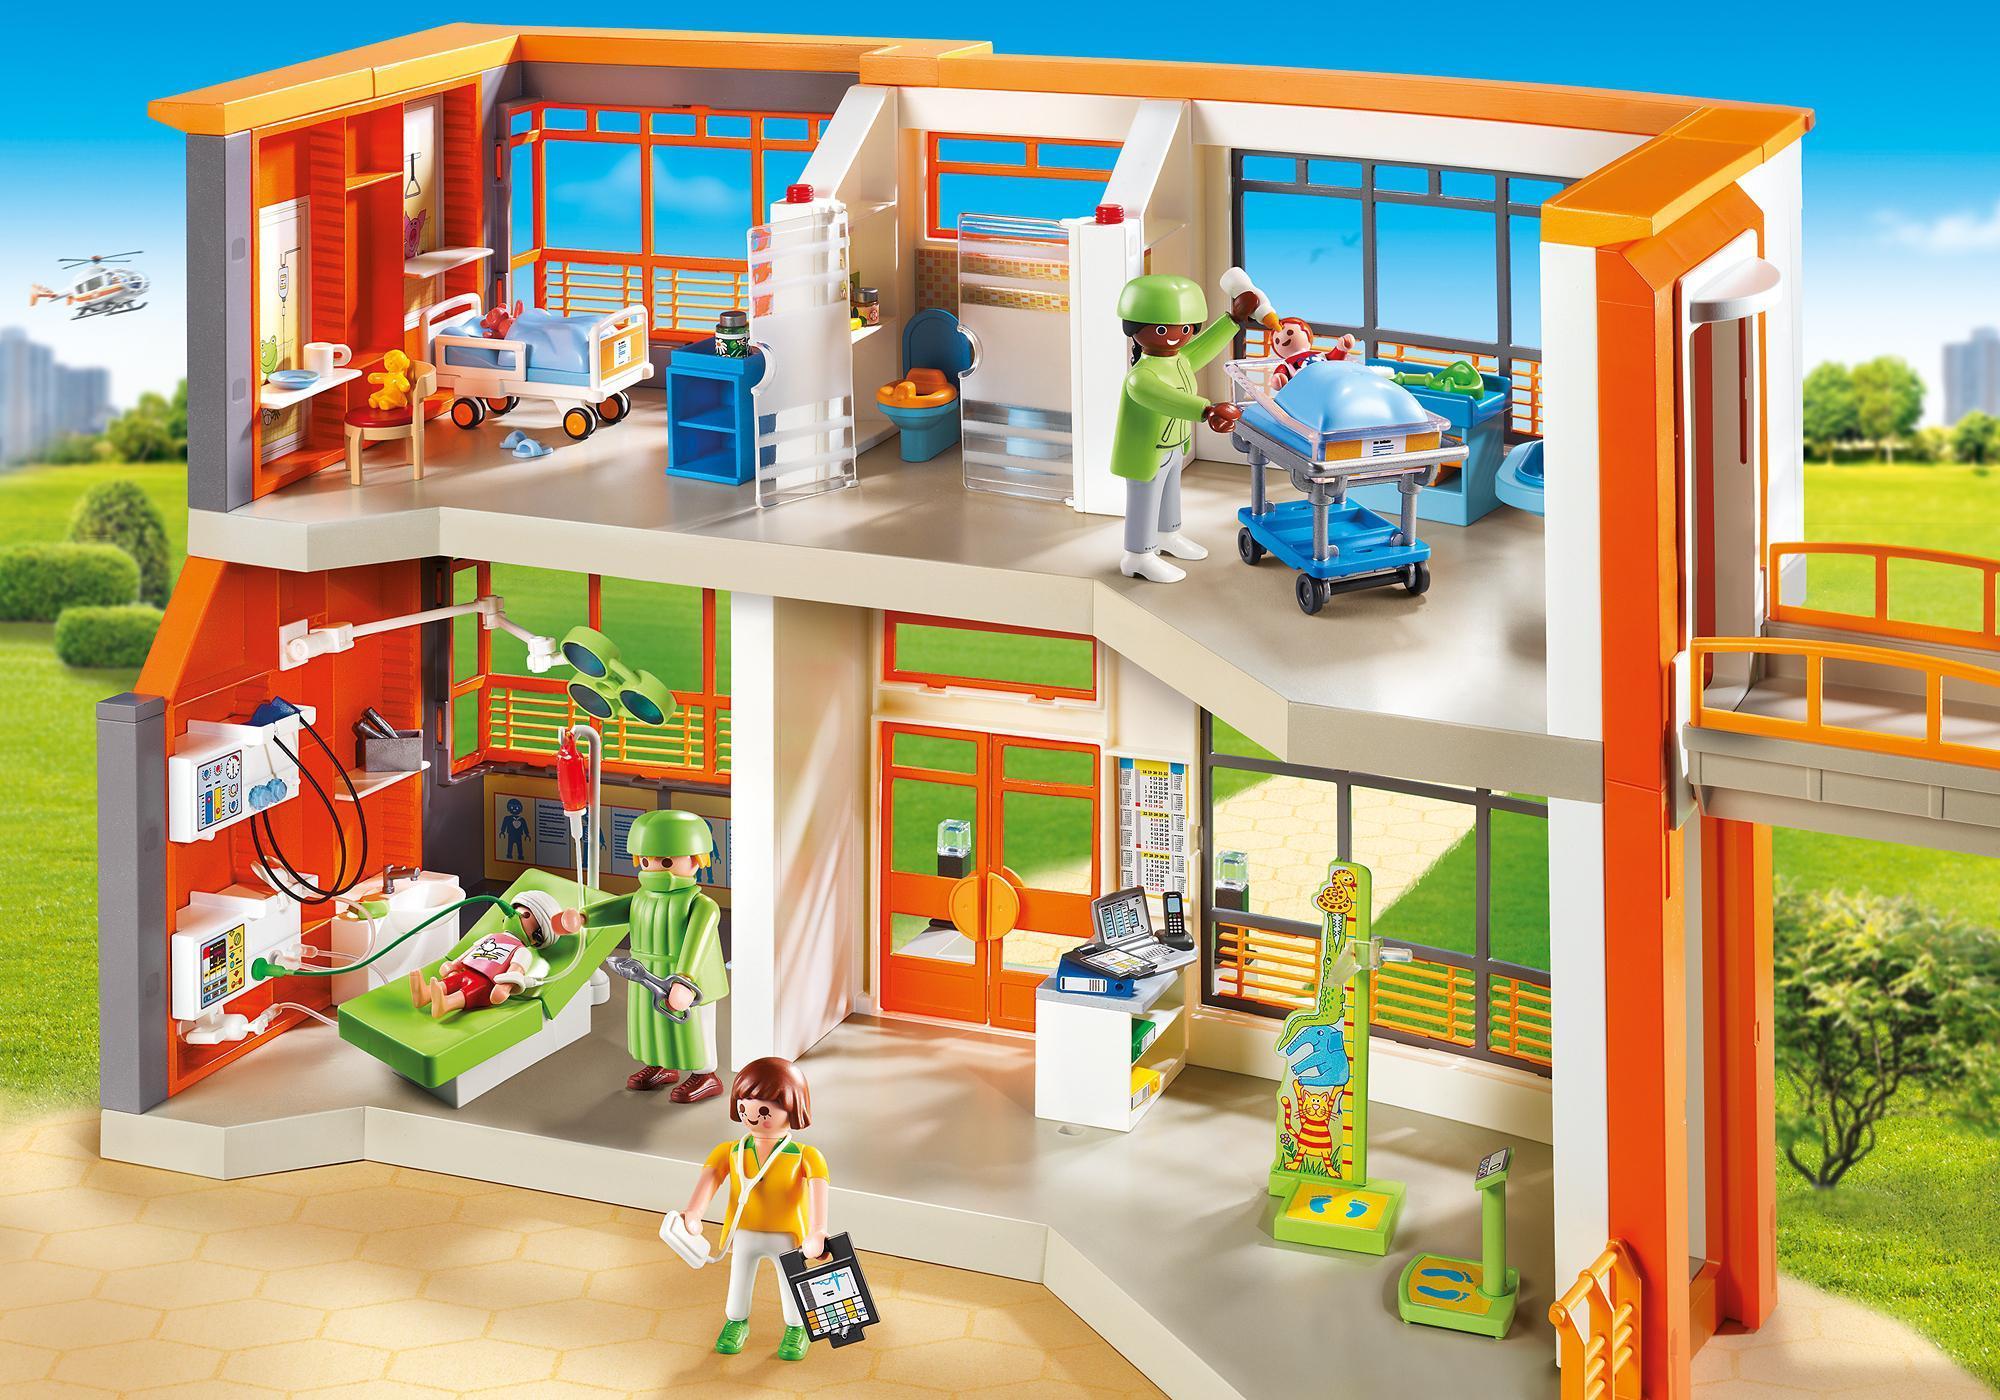 http://media.playmobil.com/i/playmobil/6657_product_detail/Hôpital pédiatrique aménagé